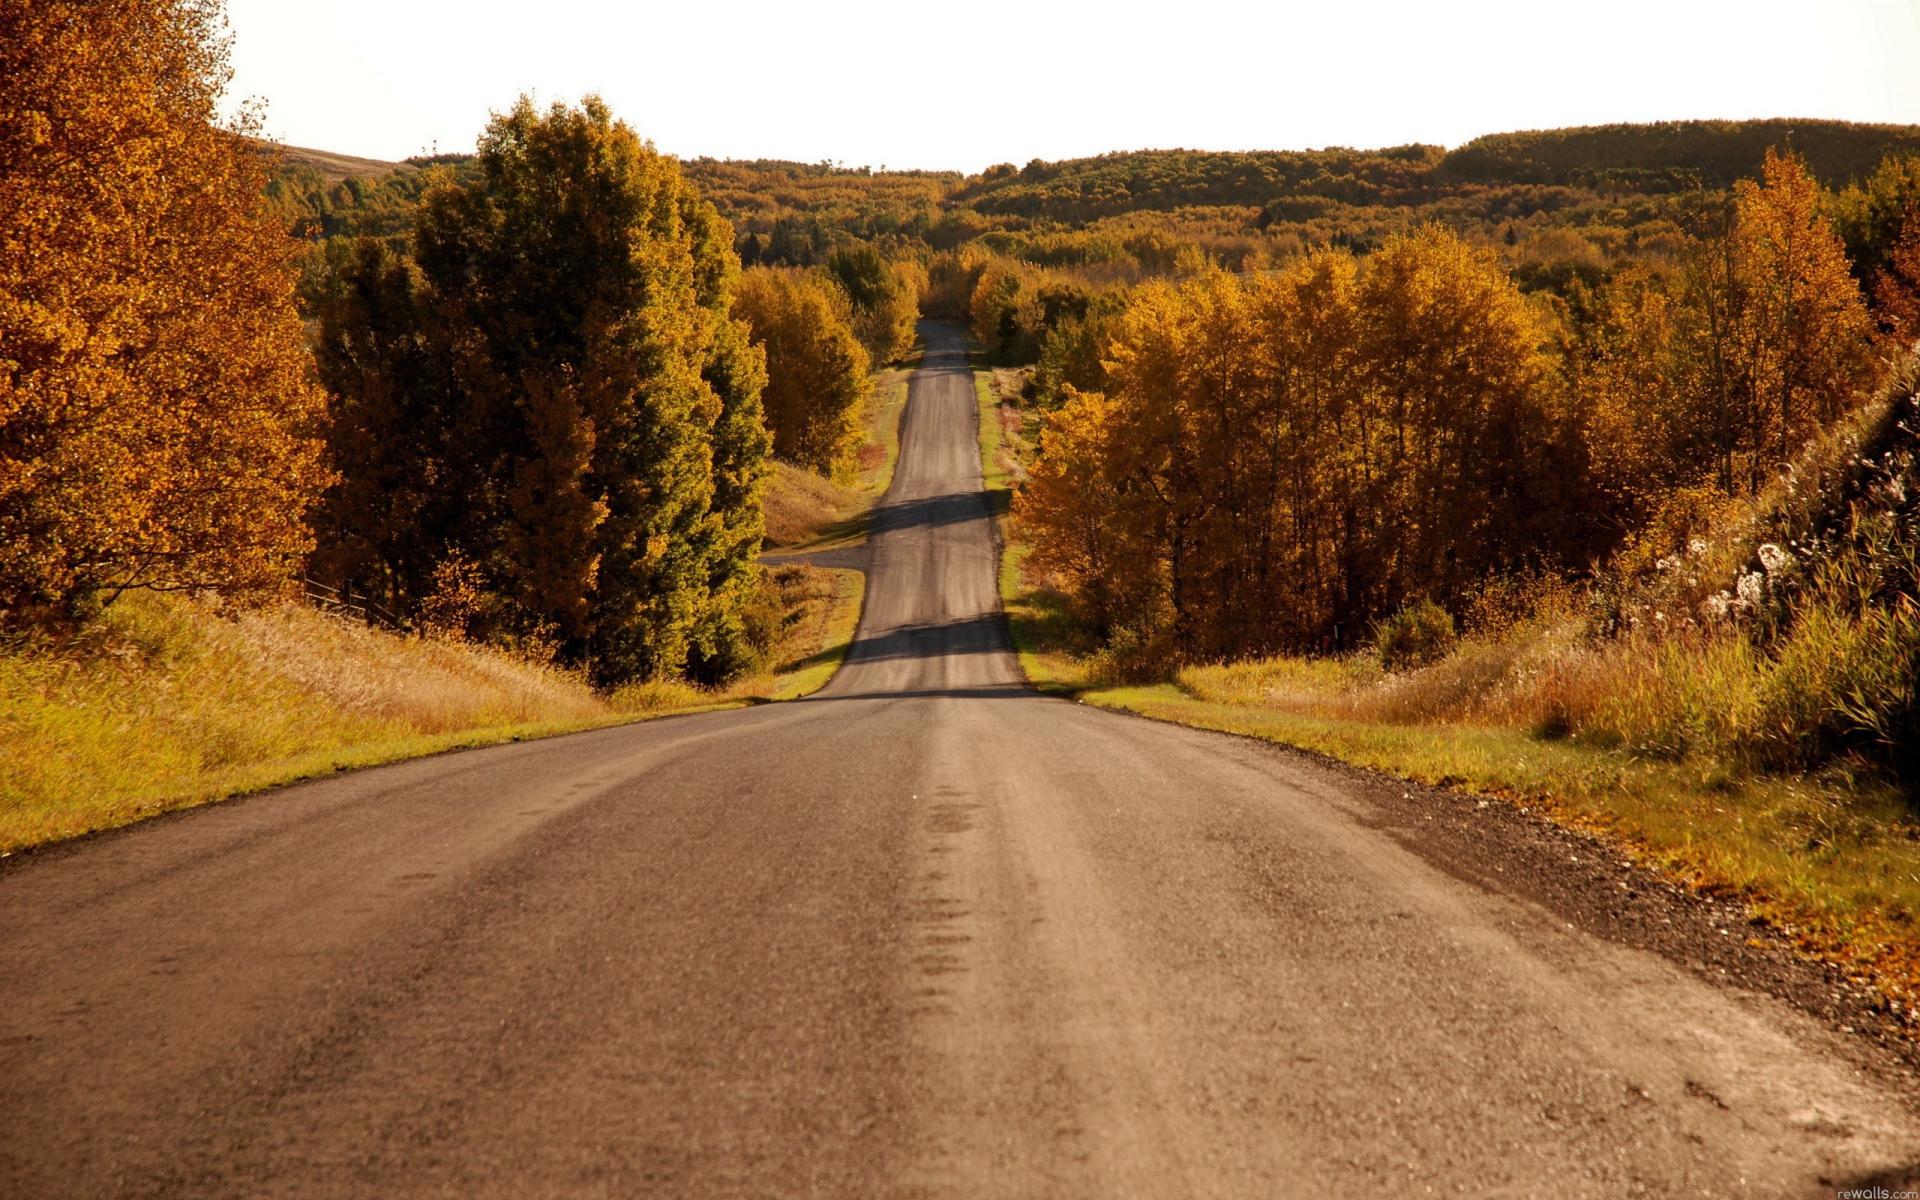 Картинки с пейзажами дорог